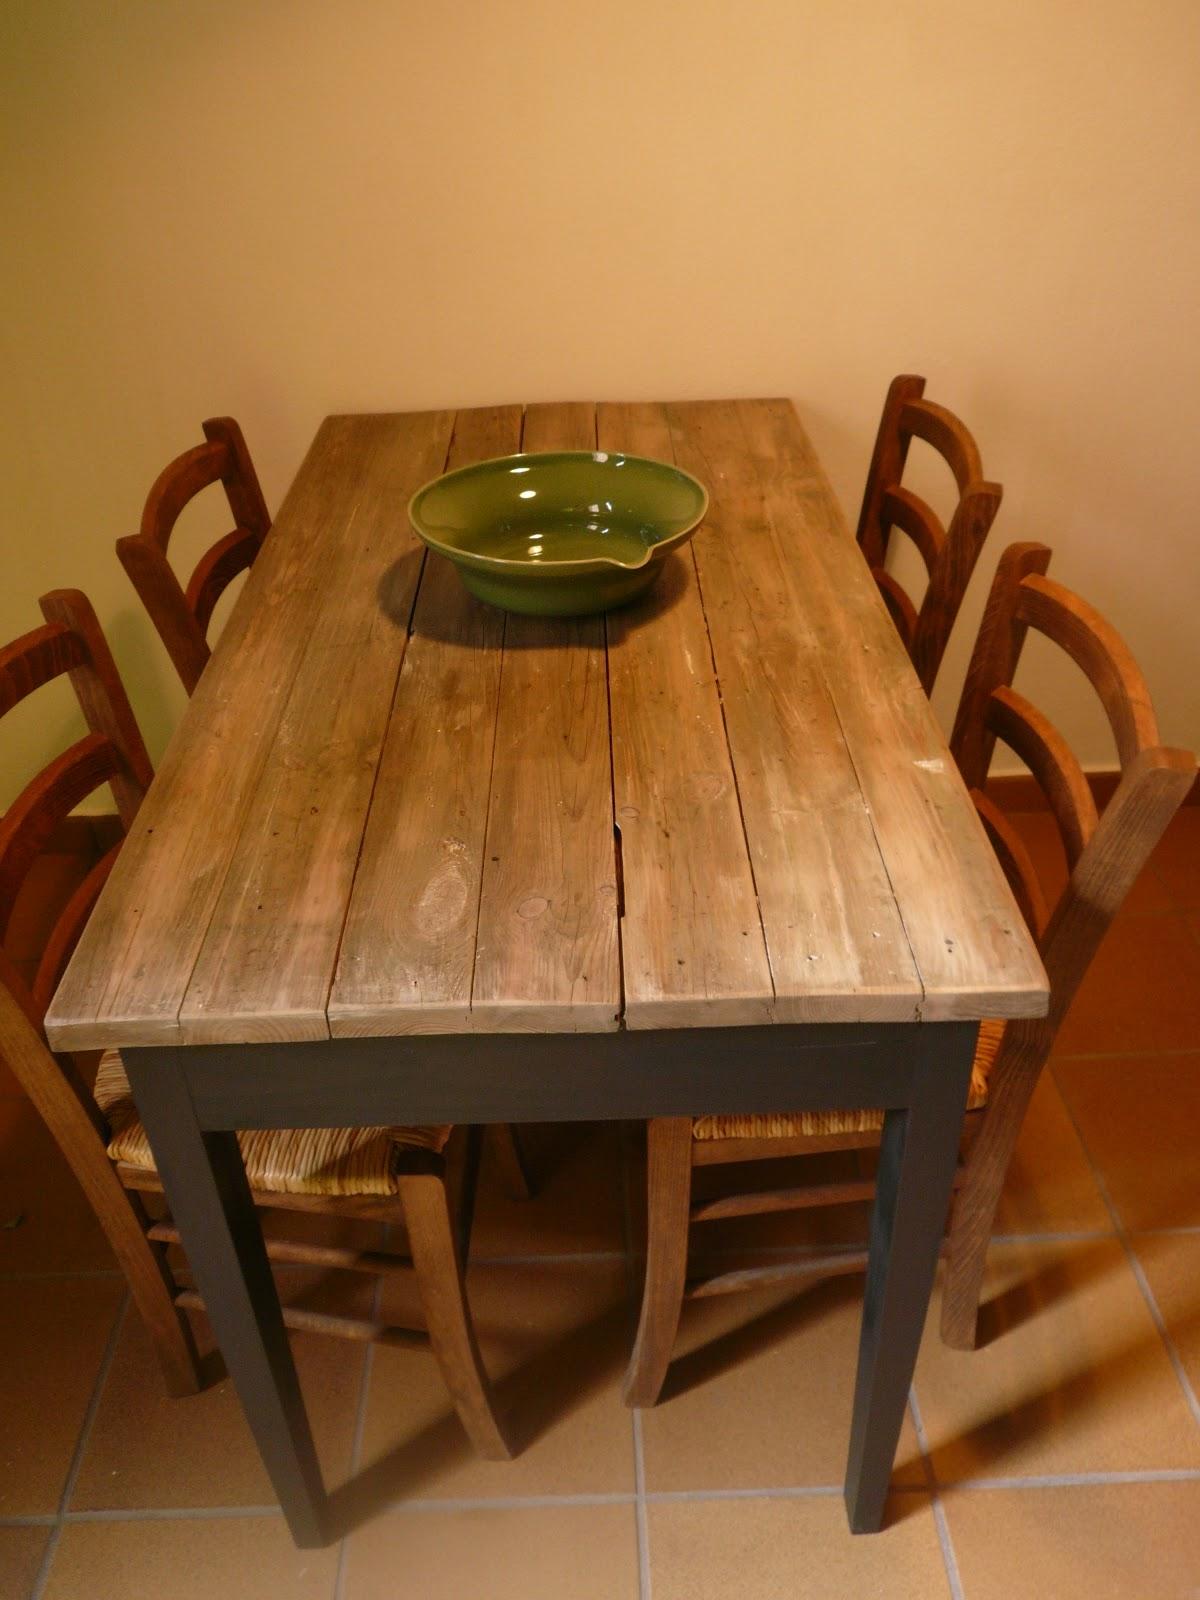 Mi las mobles taula de cuina a mida mesas de cocina a medida taules r stiques mesas r sticas - Mesa de cocina rustica ...